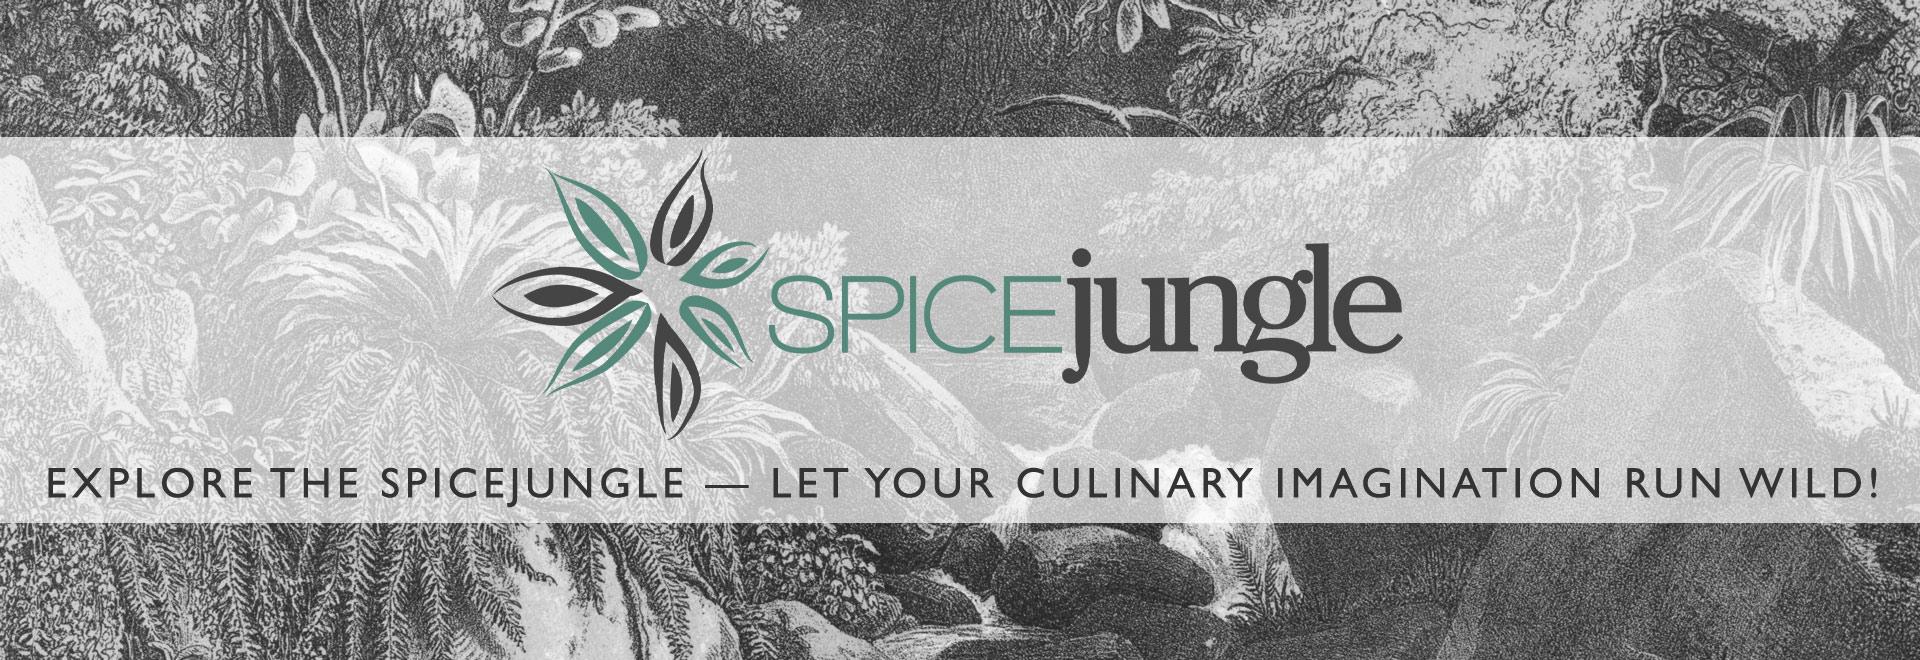 Spicejungle Banner 1